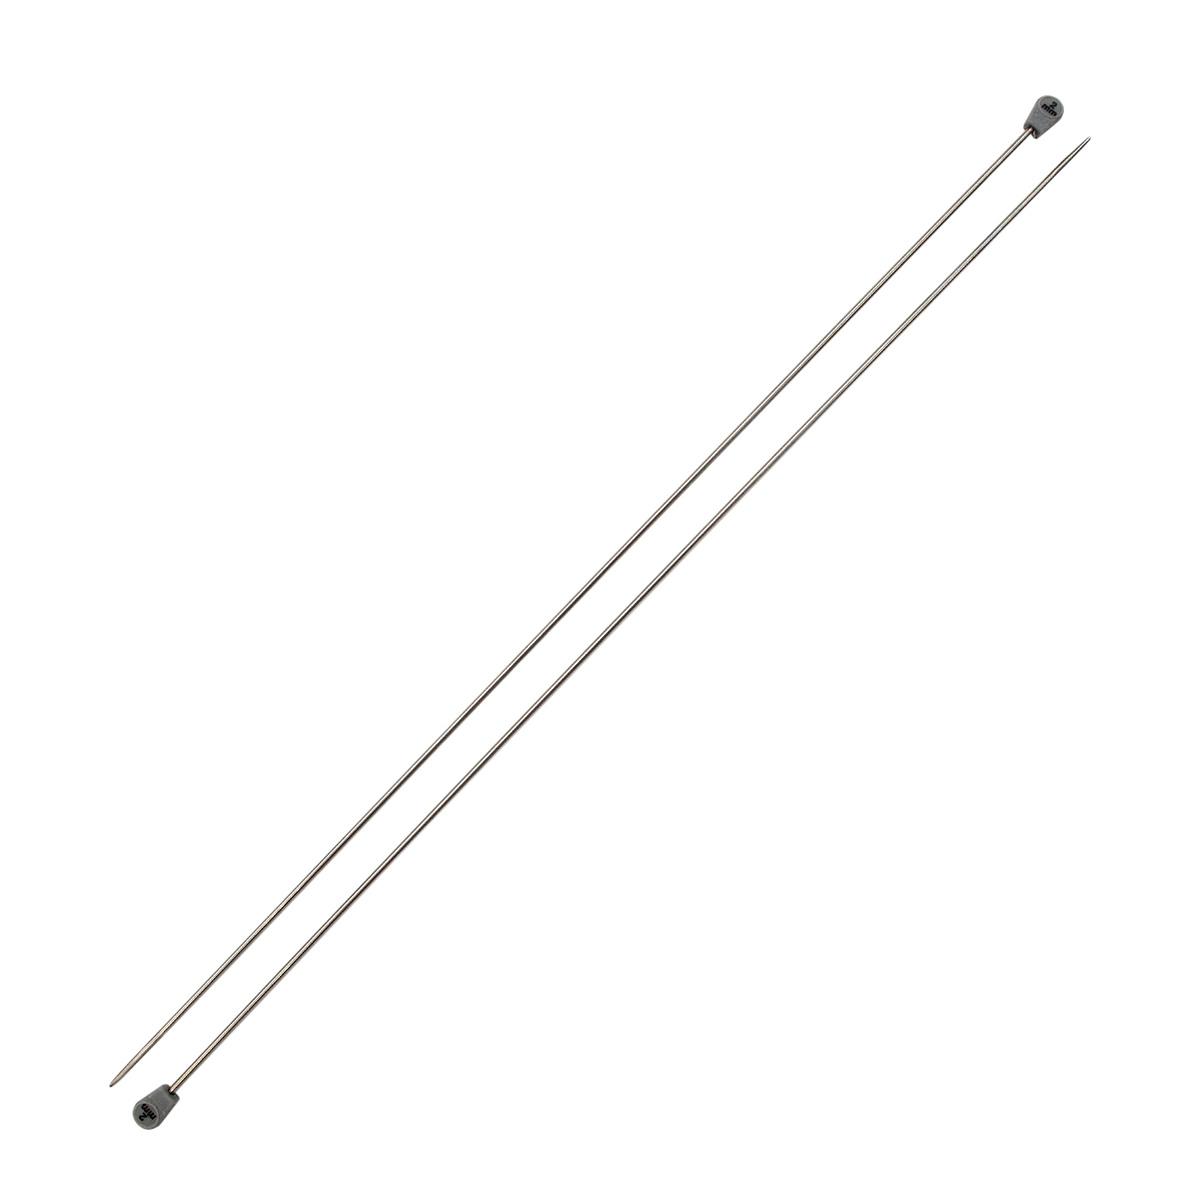 Спицы прямые металл 941220, 35 см, 2,0 мм, Hobby&Pro